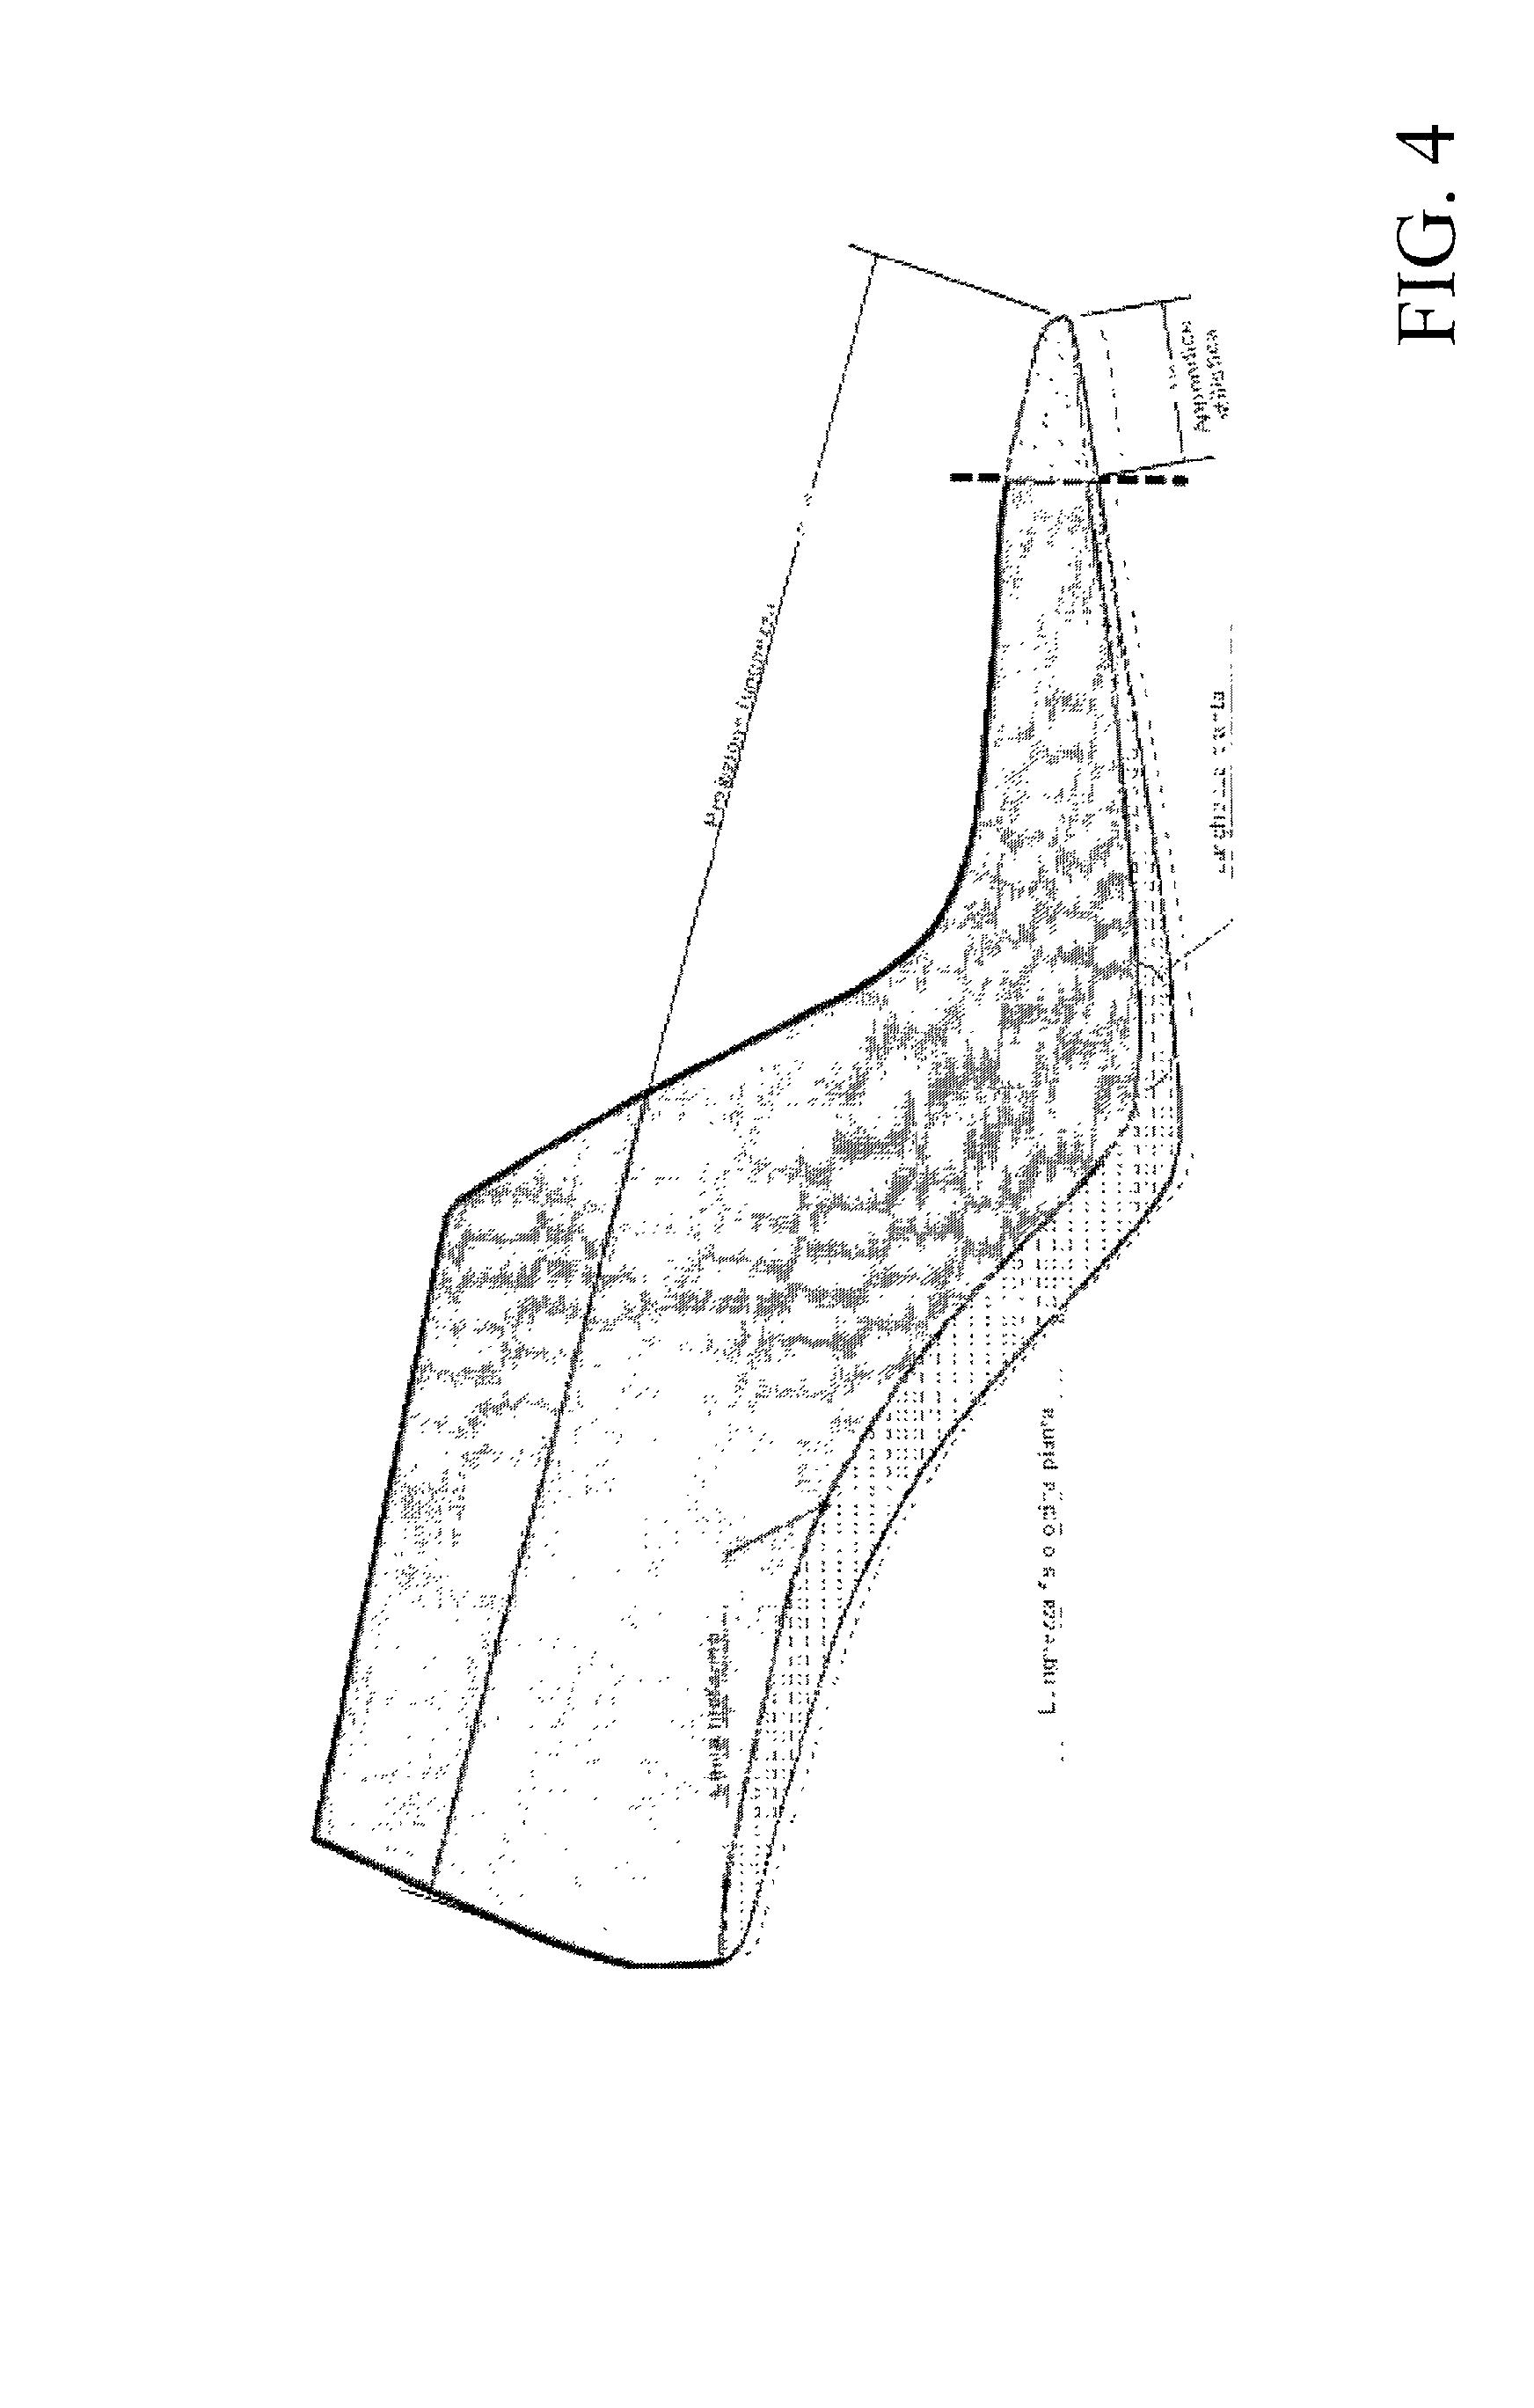 00310001 john deere hydraulic cylinder diagram john deere hydraulic cylinder